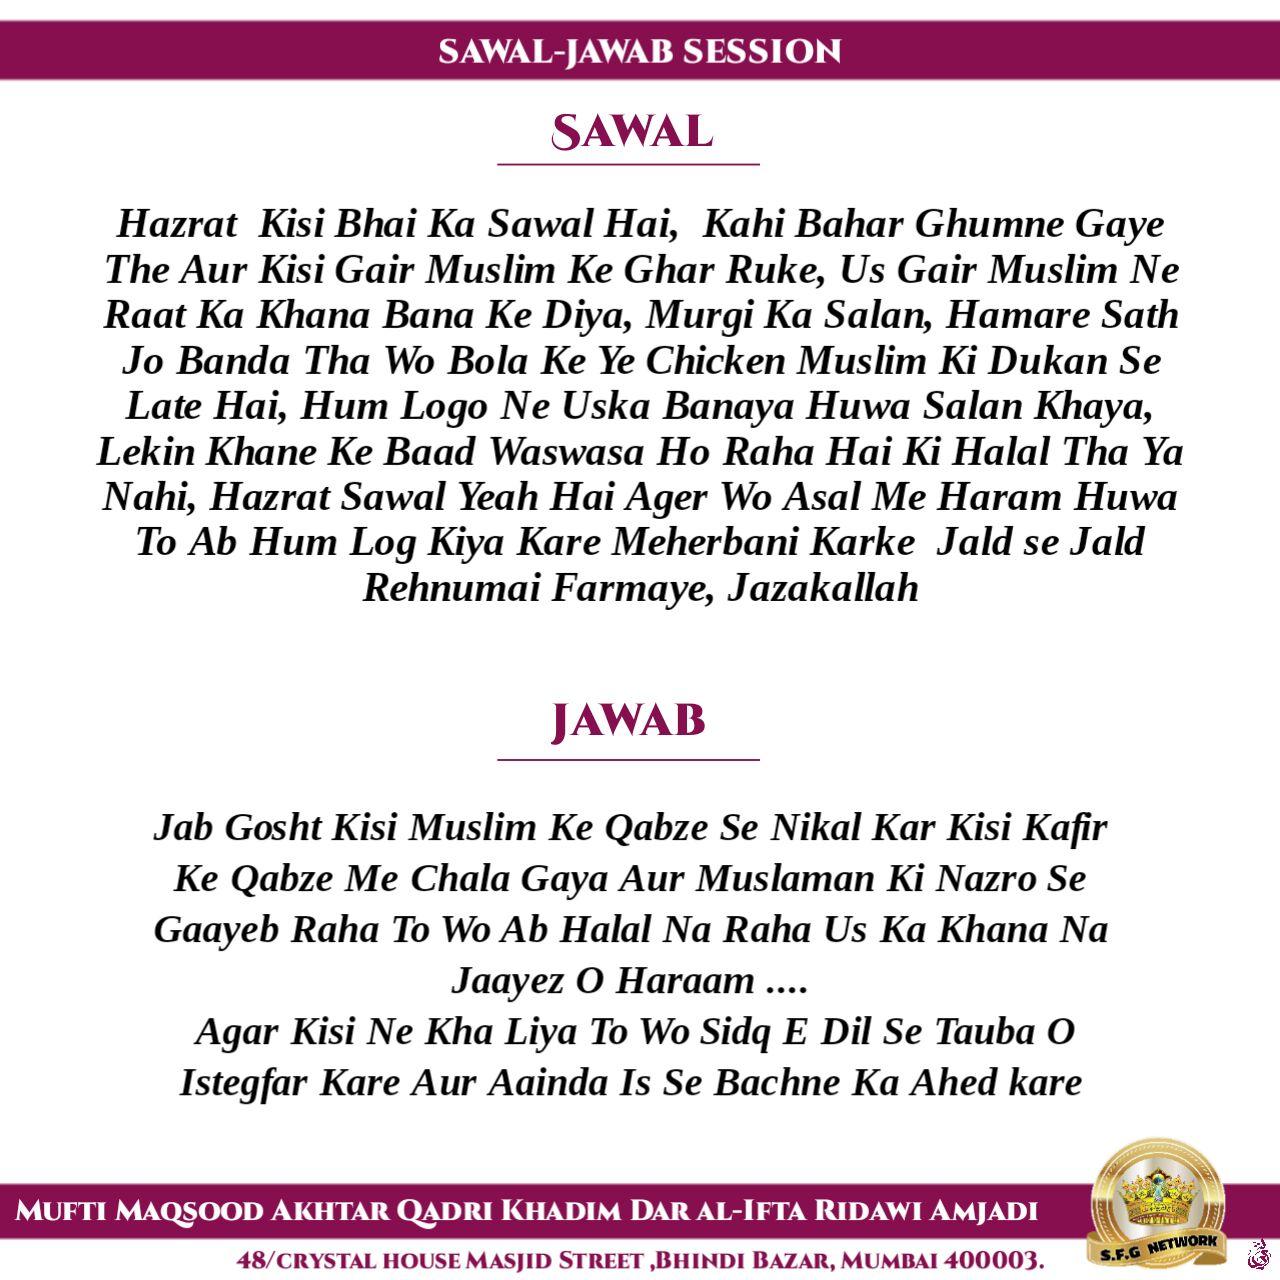 SAWAL JAWAB SESSION